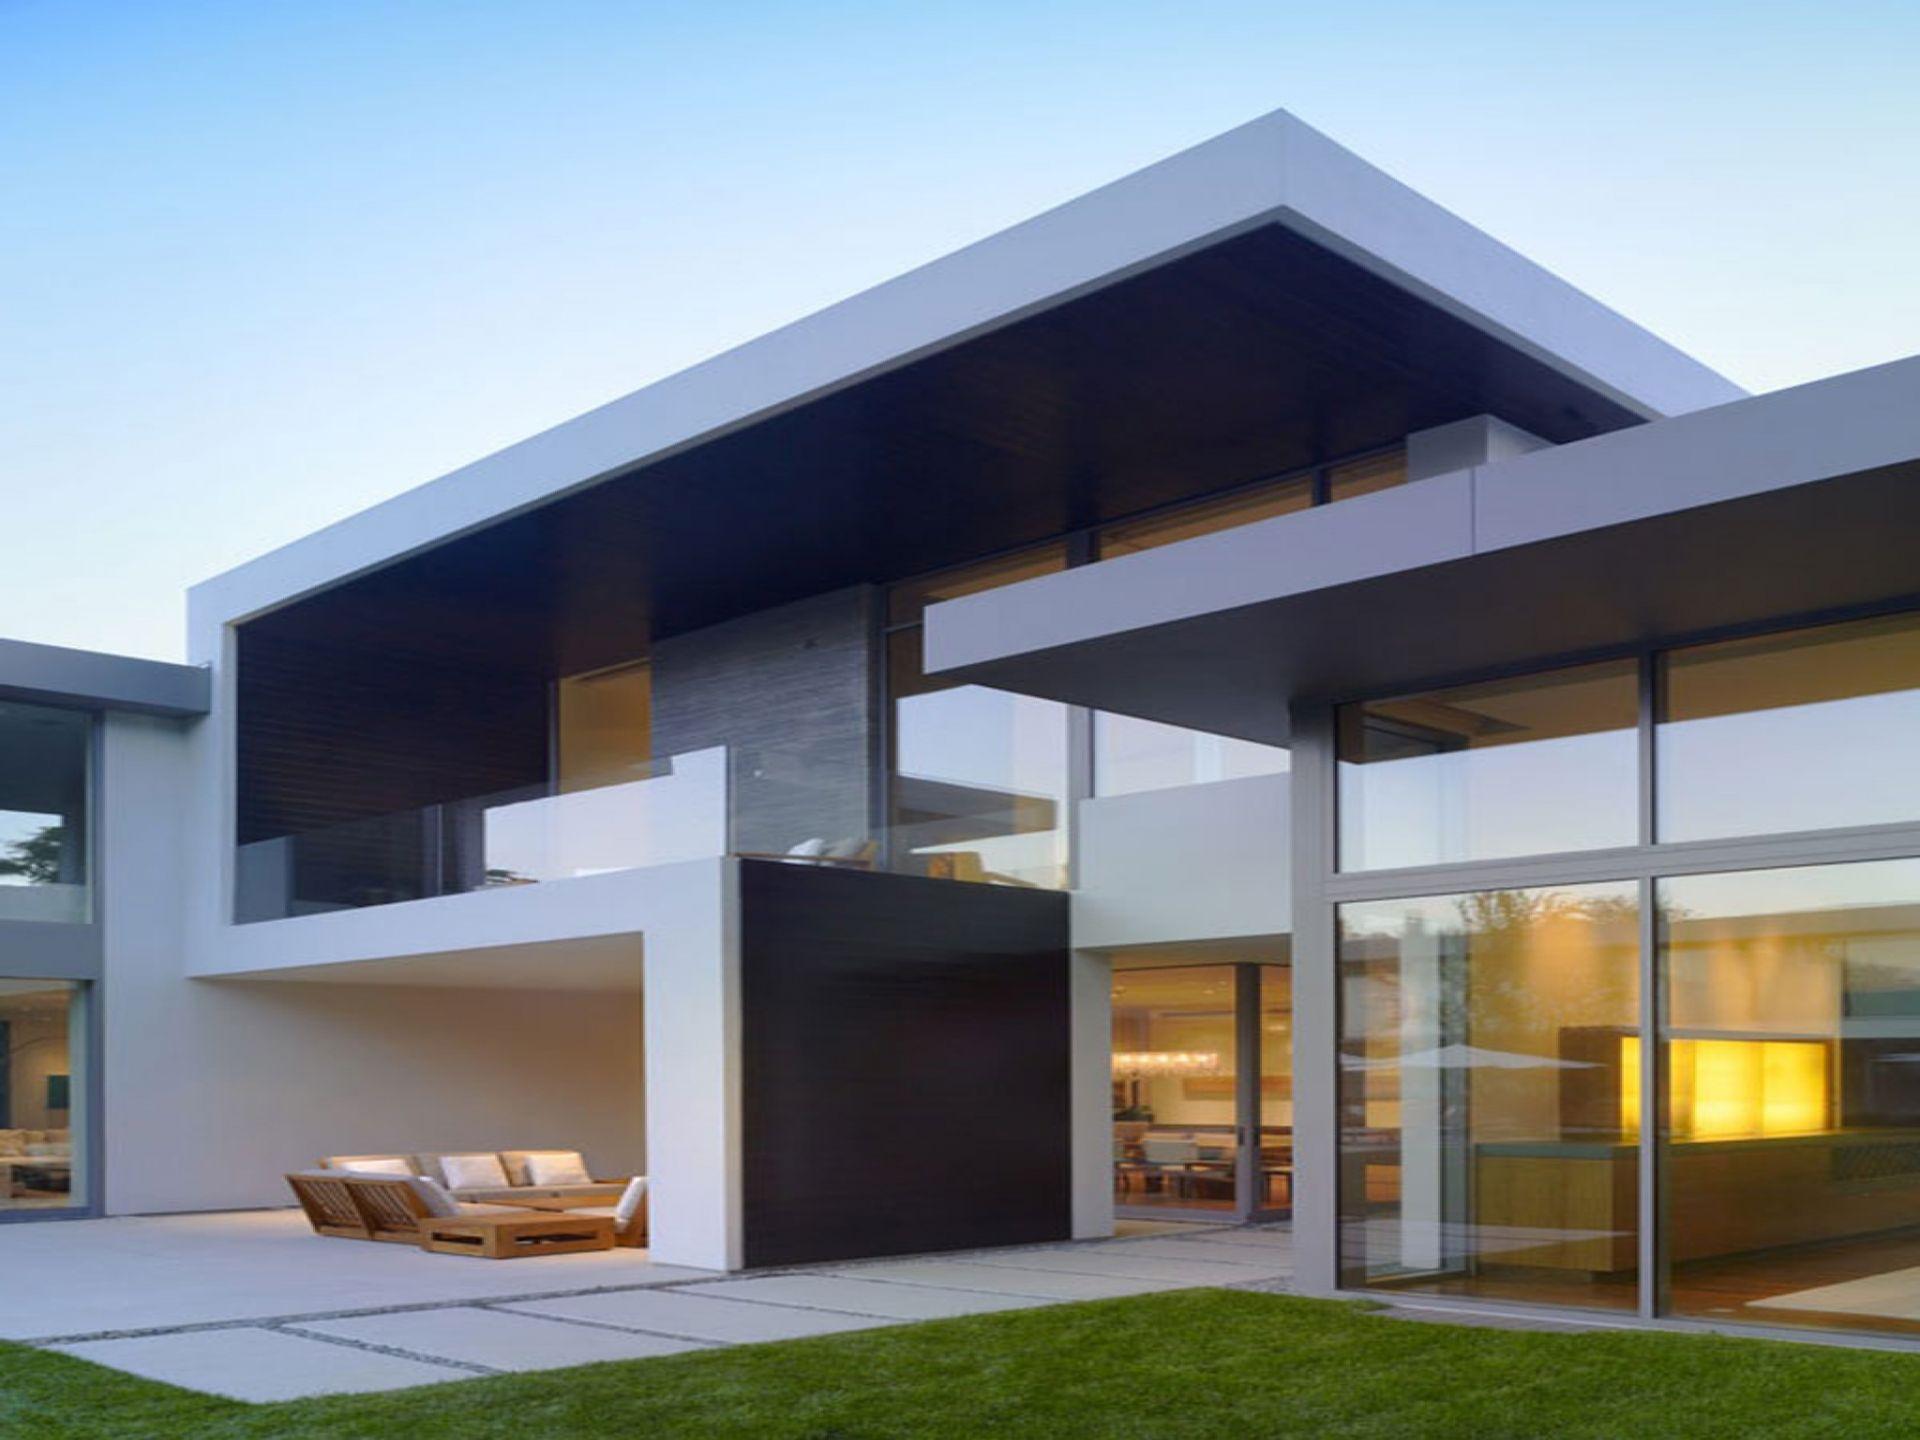 Window design for small house  bedroom design blog modern house design inspiration a  minimalist